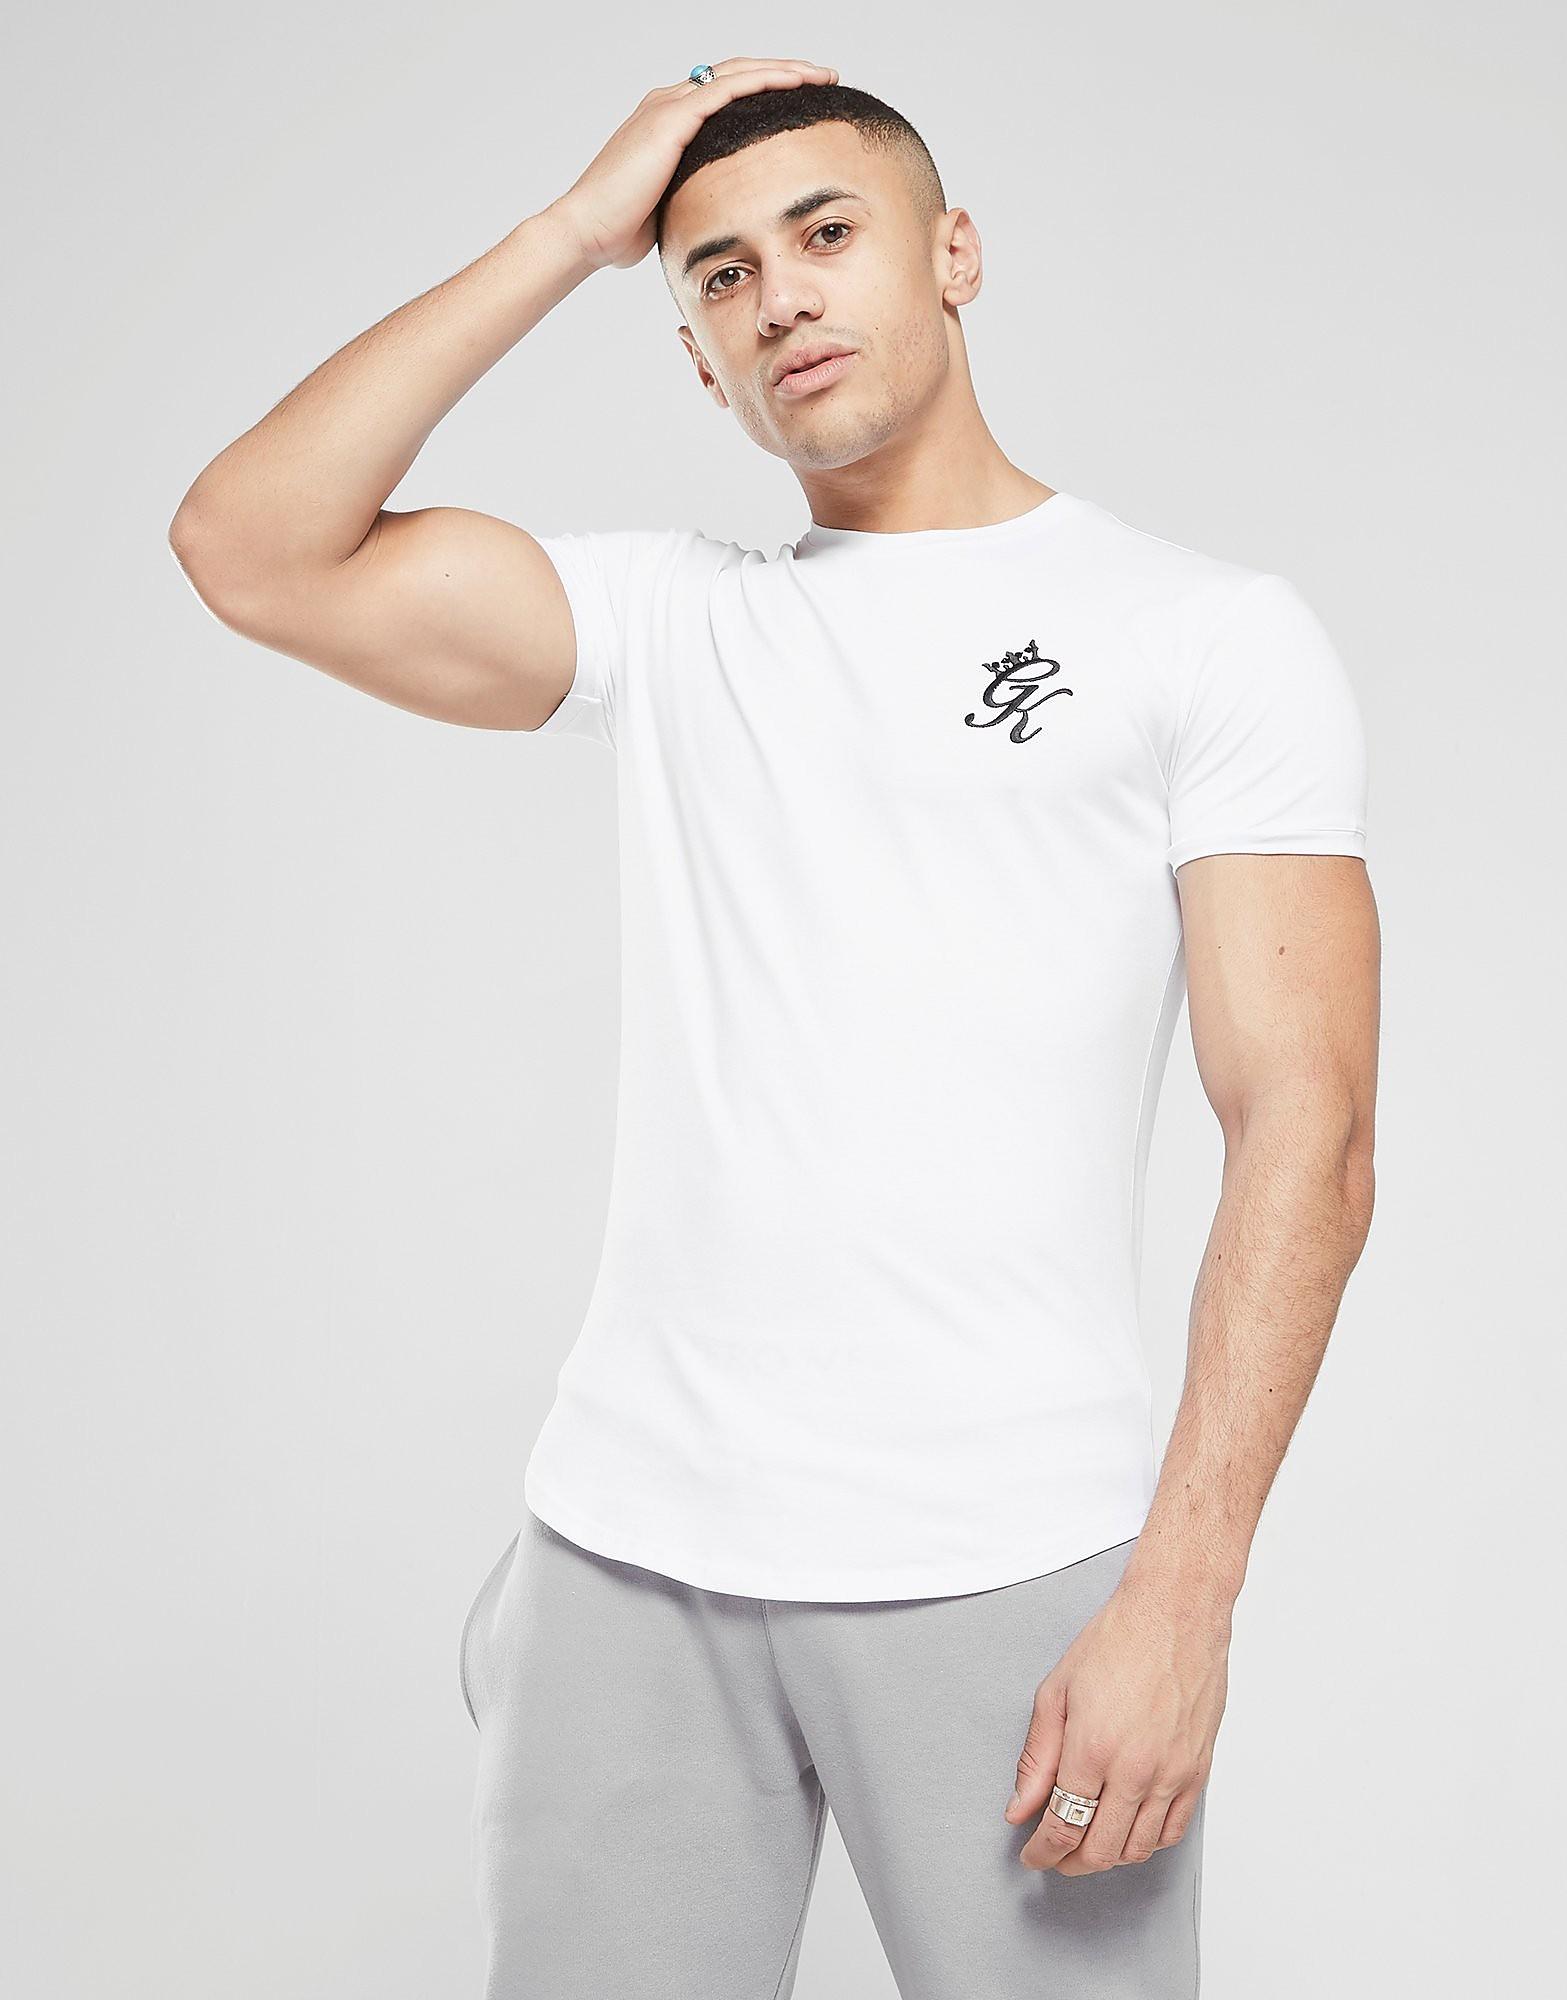 Gym King Core T-Shirt Heren - Wit - Heren